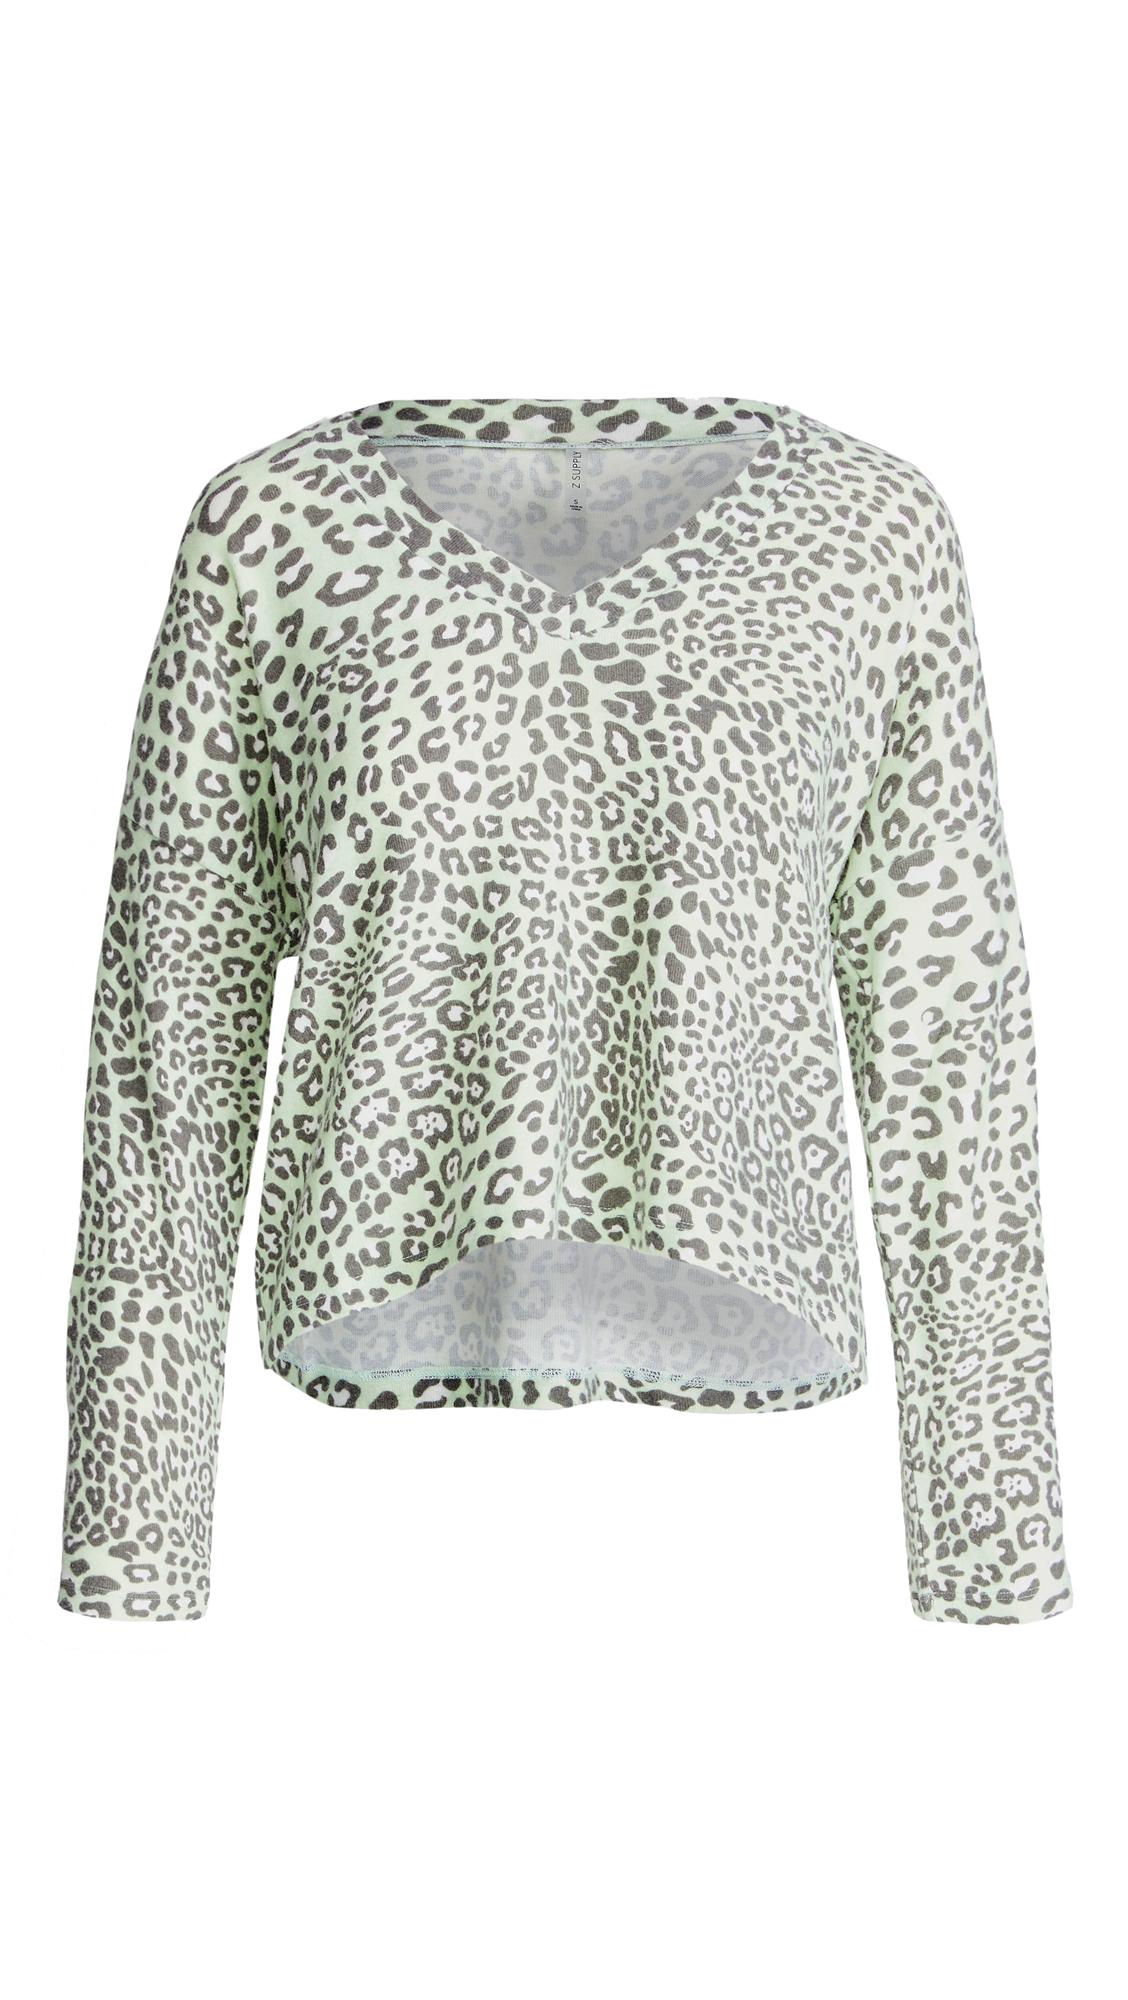 Z Supply Lyra Leopard Top